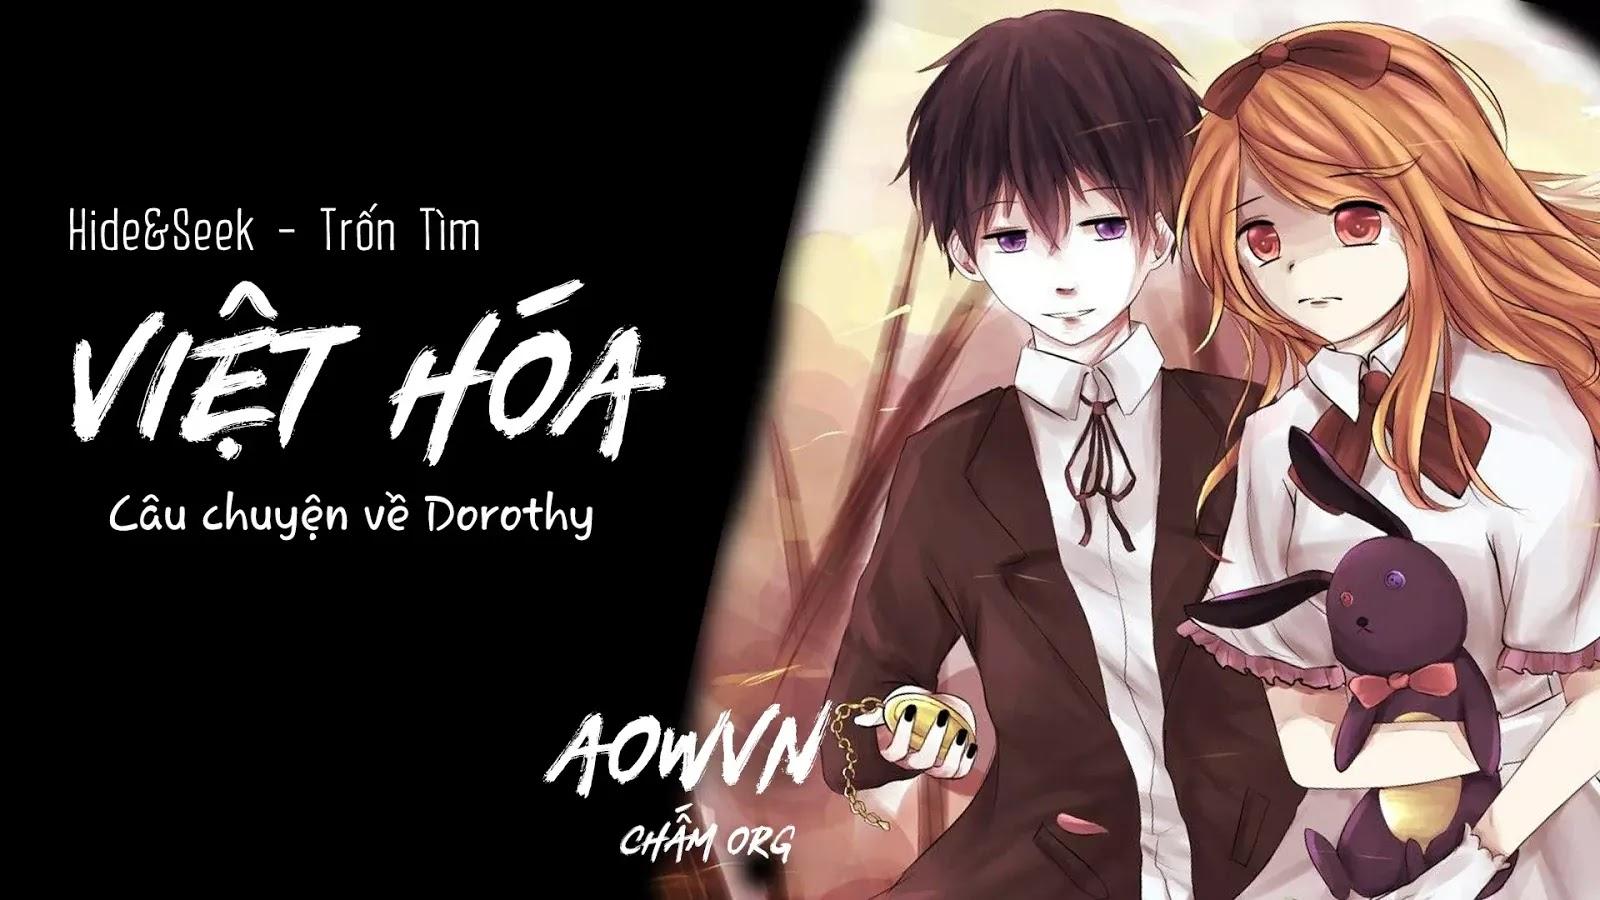 game android hideandseek viet hoa aowvn%2B%25281%2529 - [ HOT ] Game HideAndSeek Việt Hóa - Trốn Tìm   Android RPG Kinh Dị